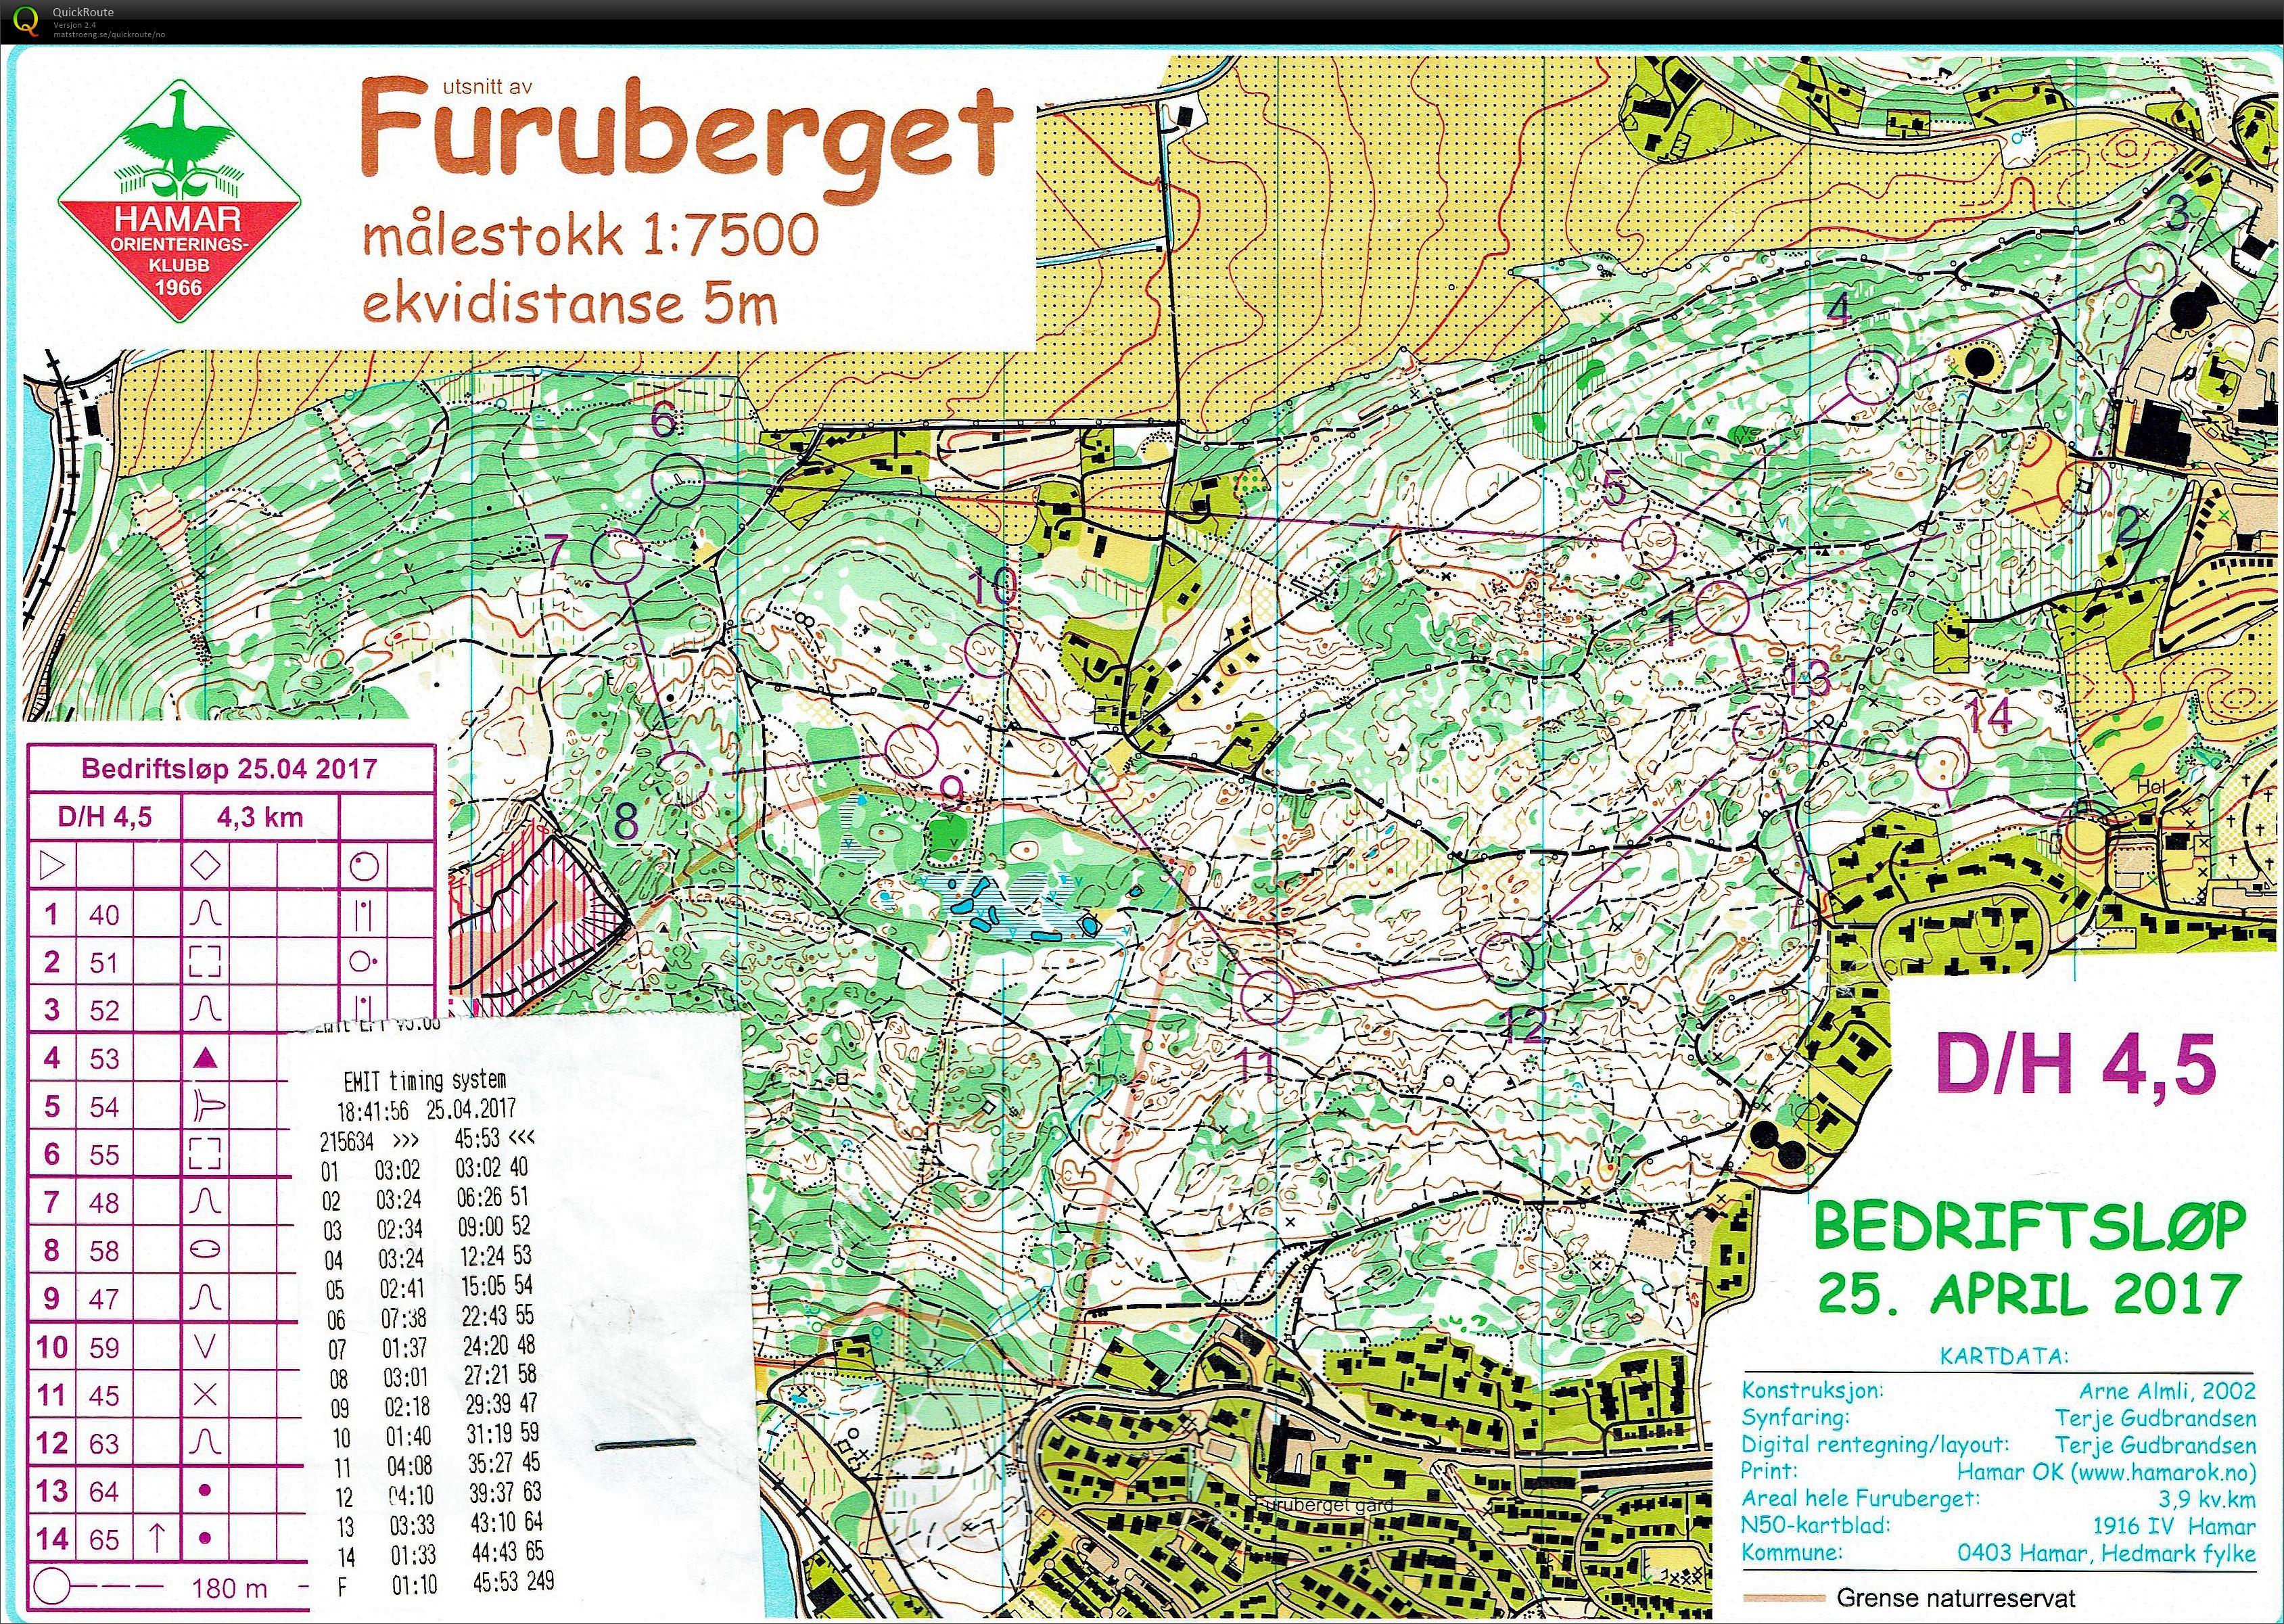 furuberget kart Hamar map furuberget kart